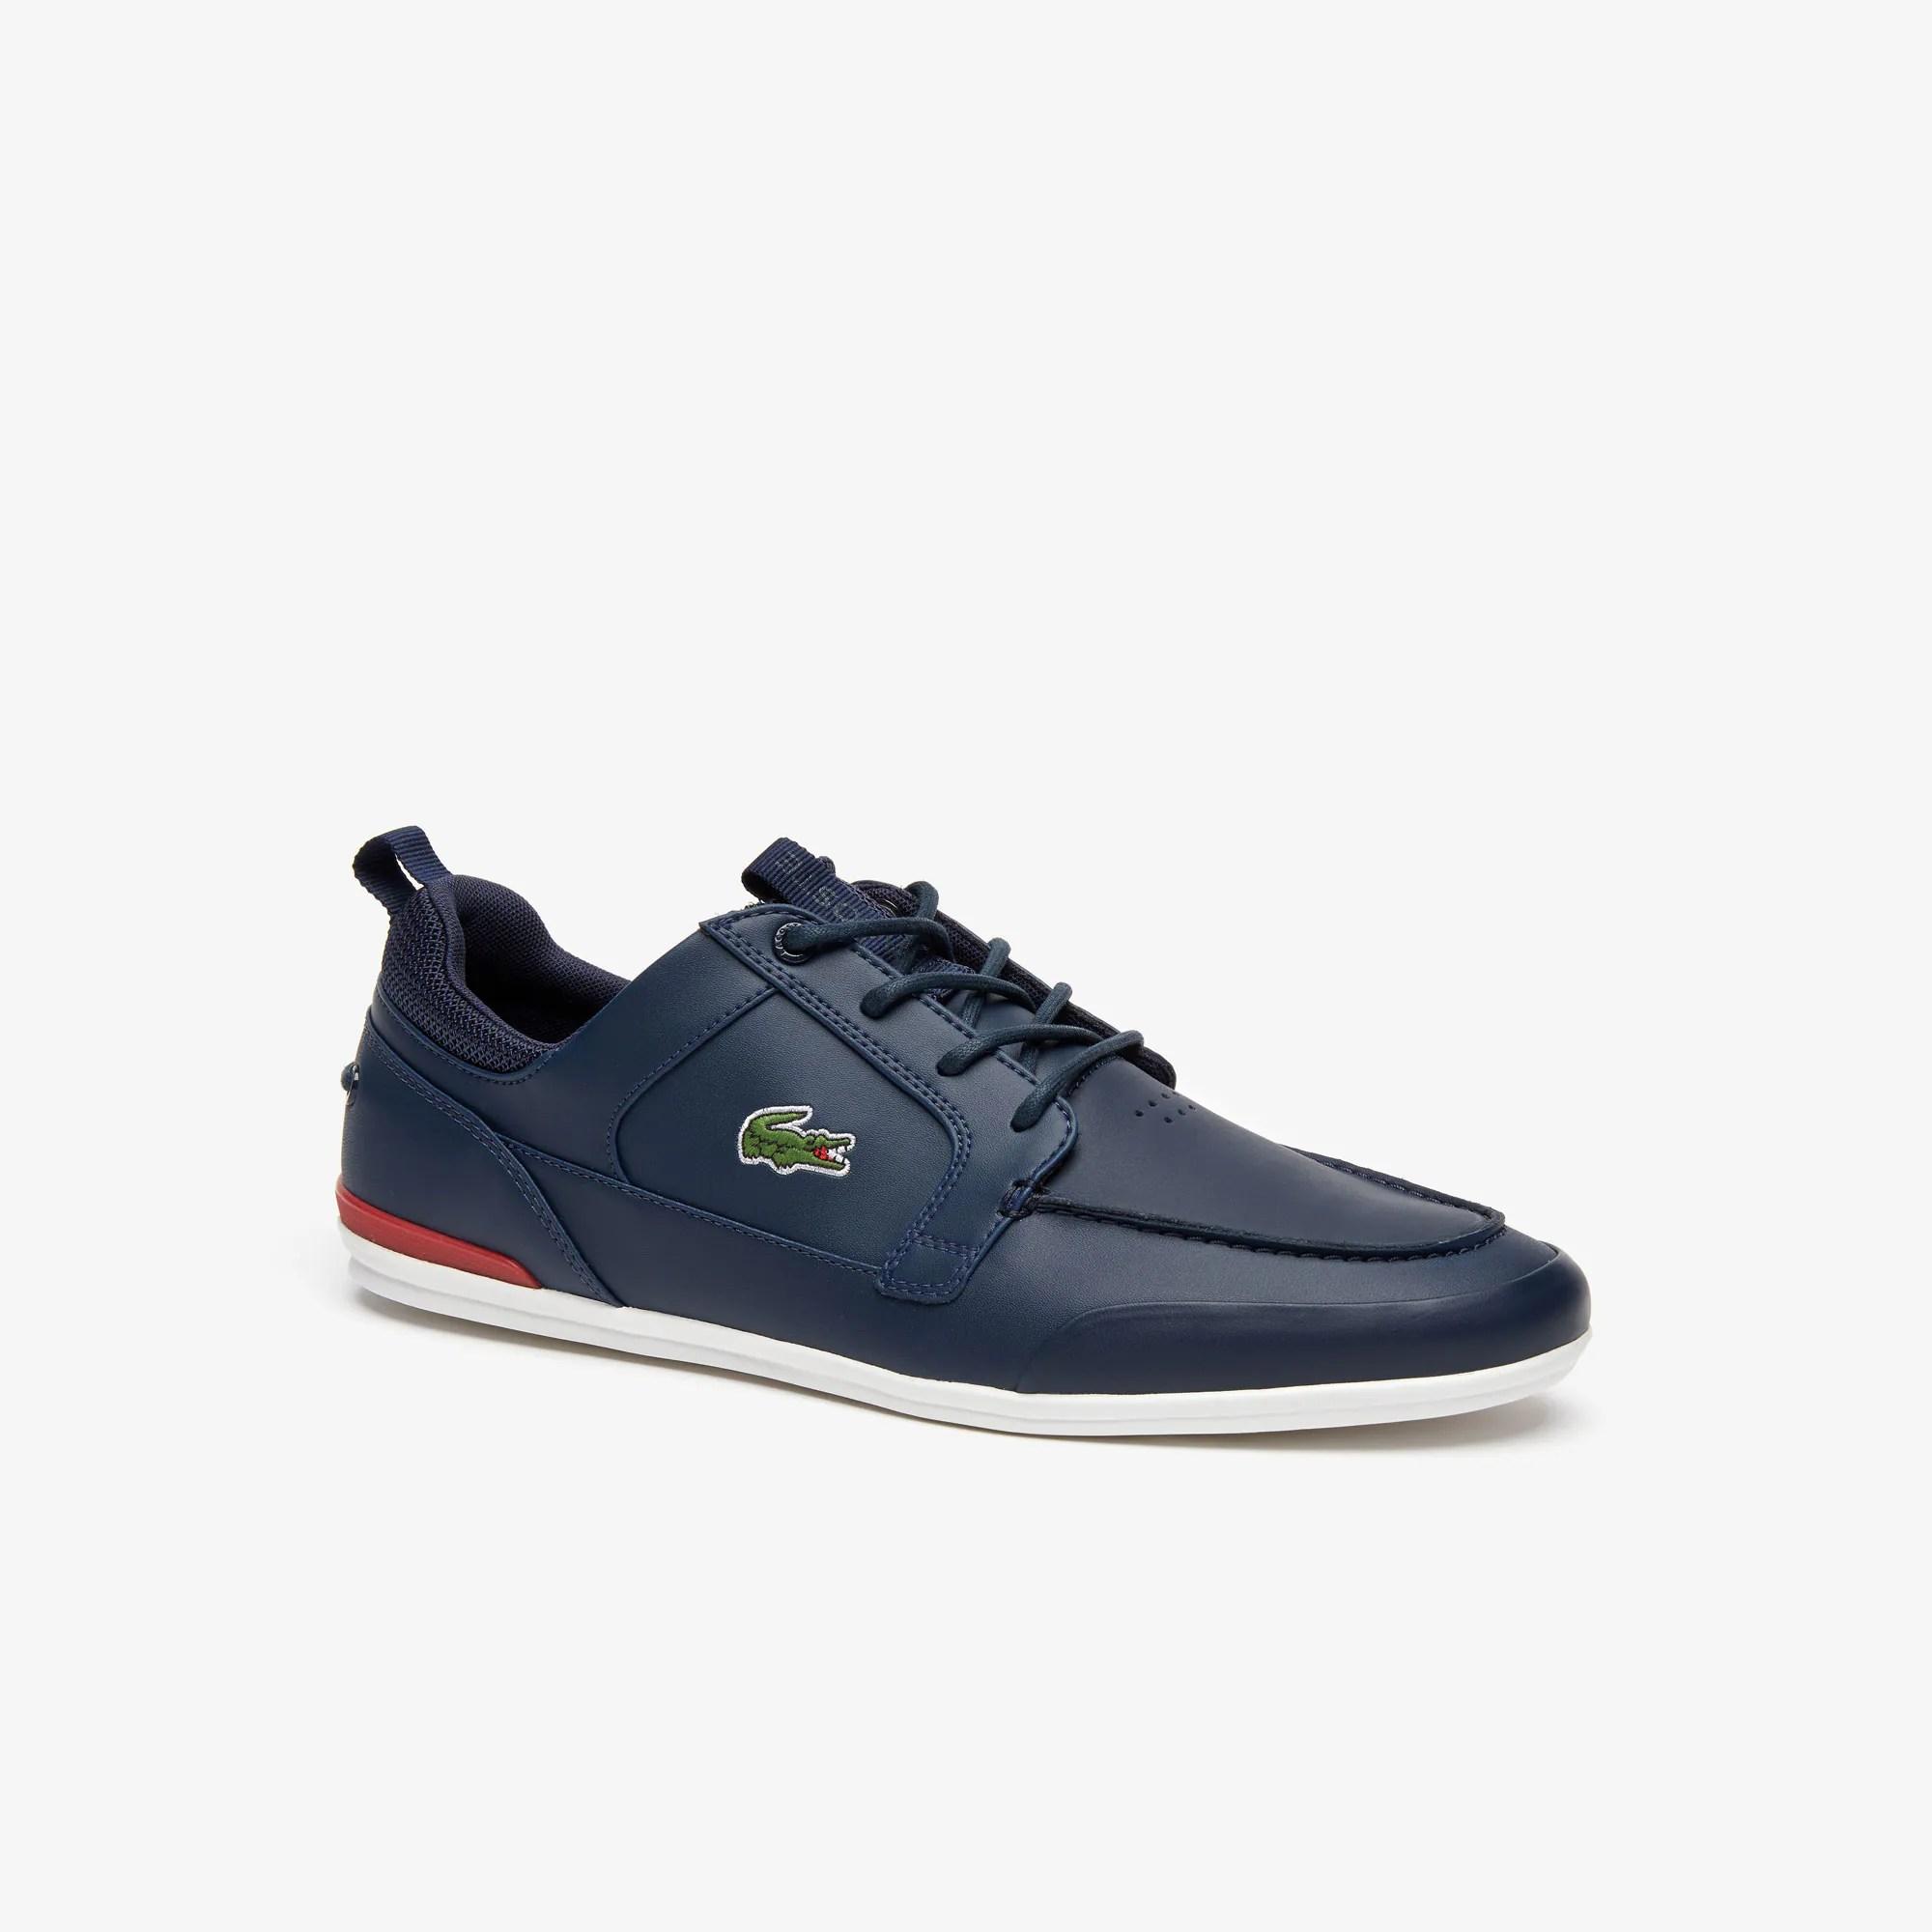 Slip On Shoes Without Backs